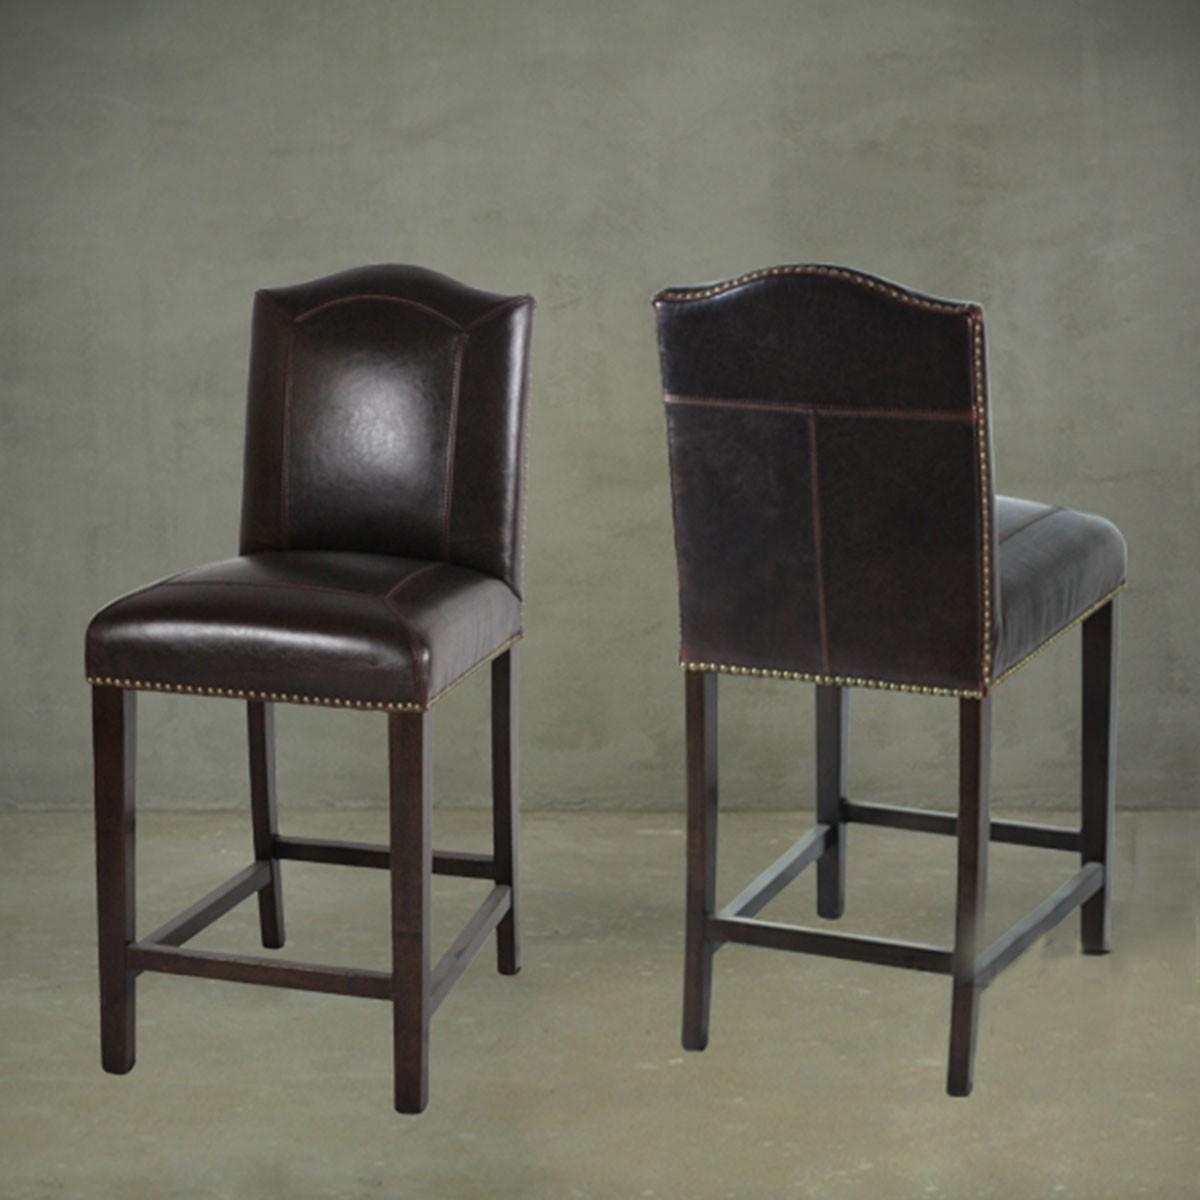 Upholstered Wooden Bar Stool Pjl321 Decoraport Usa